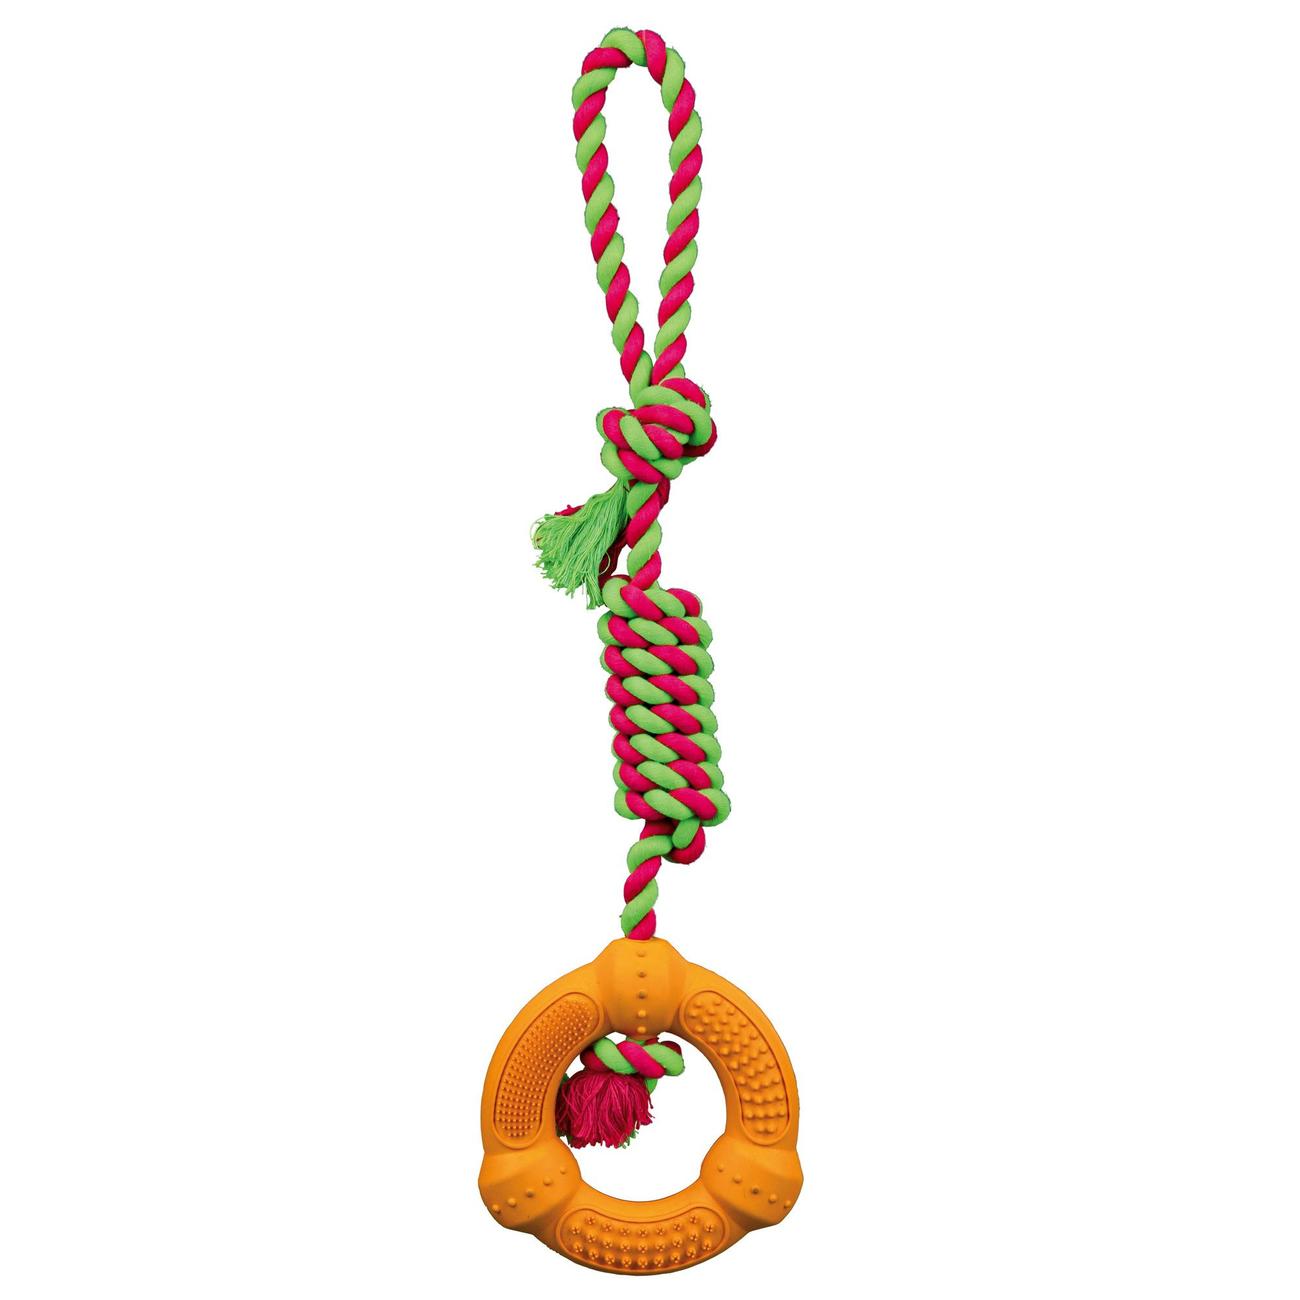 TRIXIE Hundespielzeug Ring am Tau 33191, Bild 2